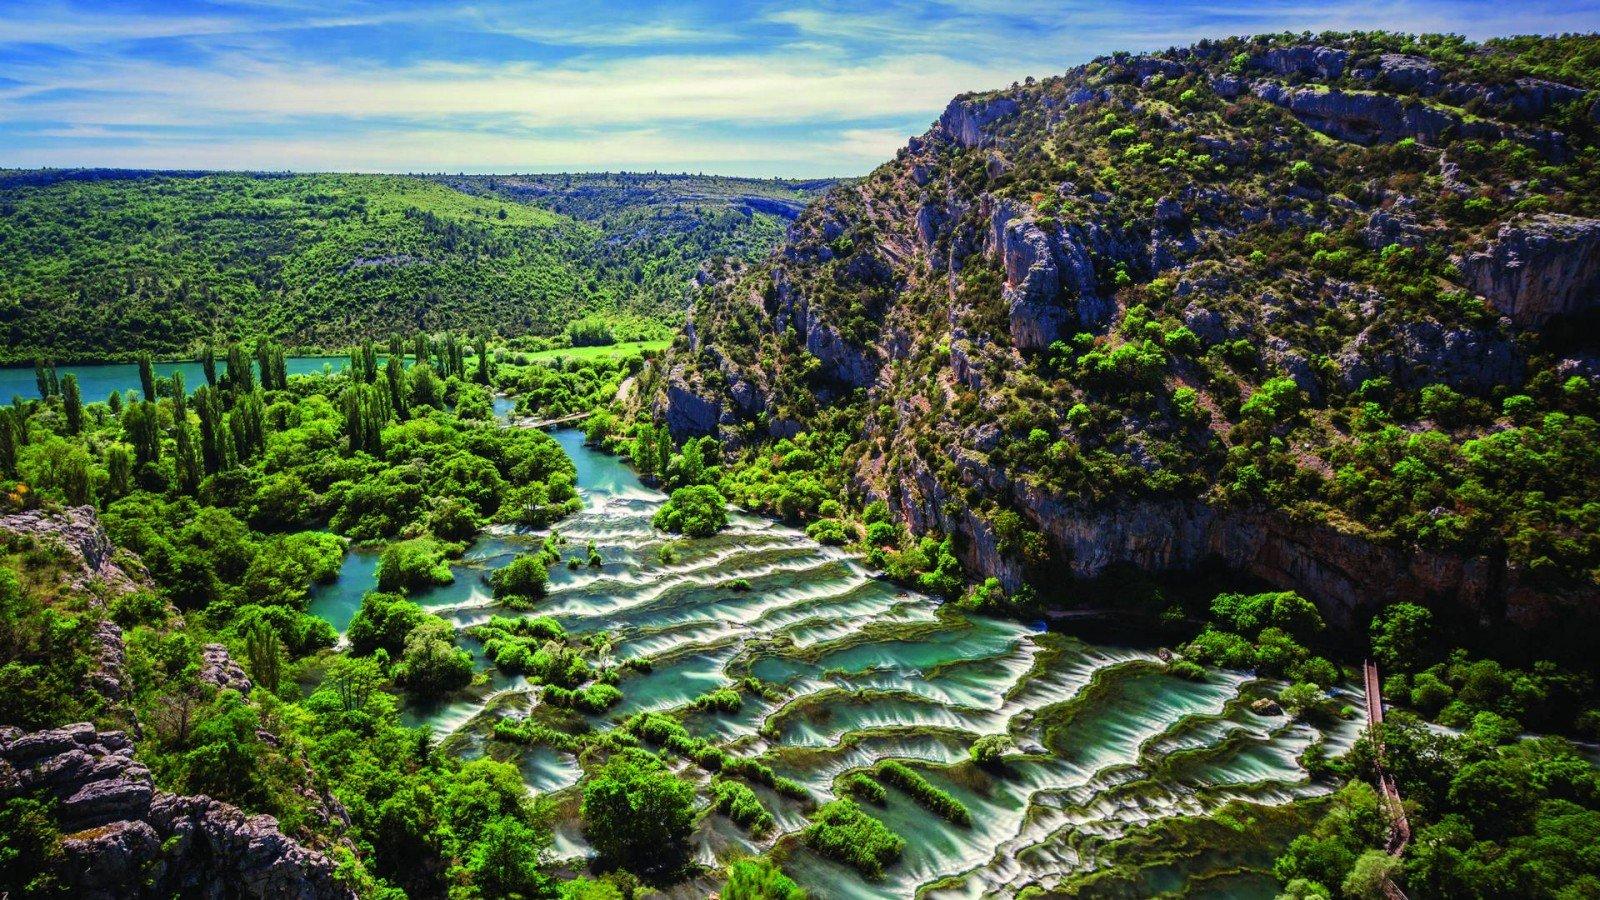 N.P. Krka Waterfalls, Šibenik & Primošten